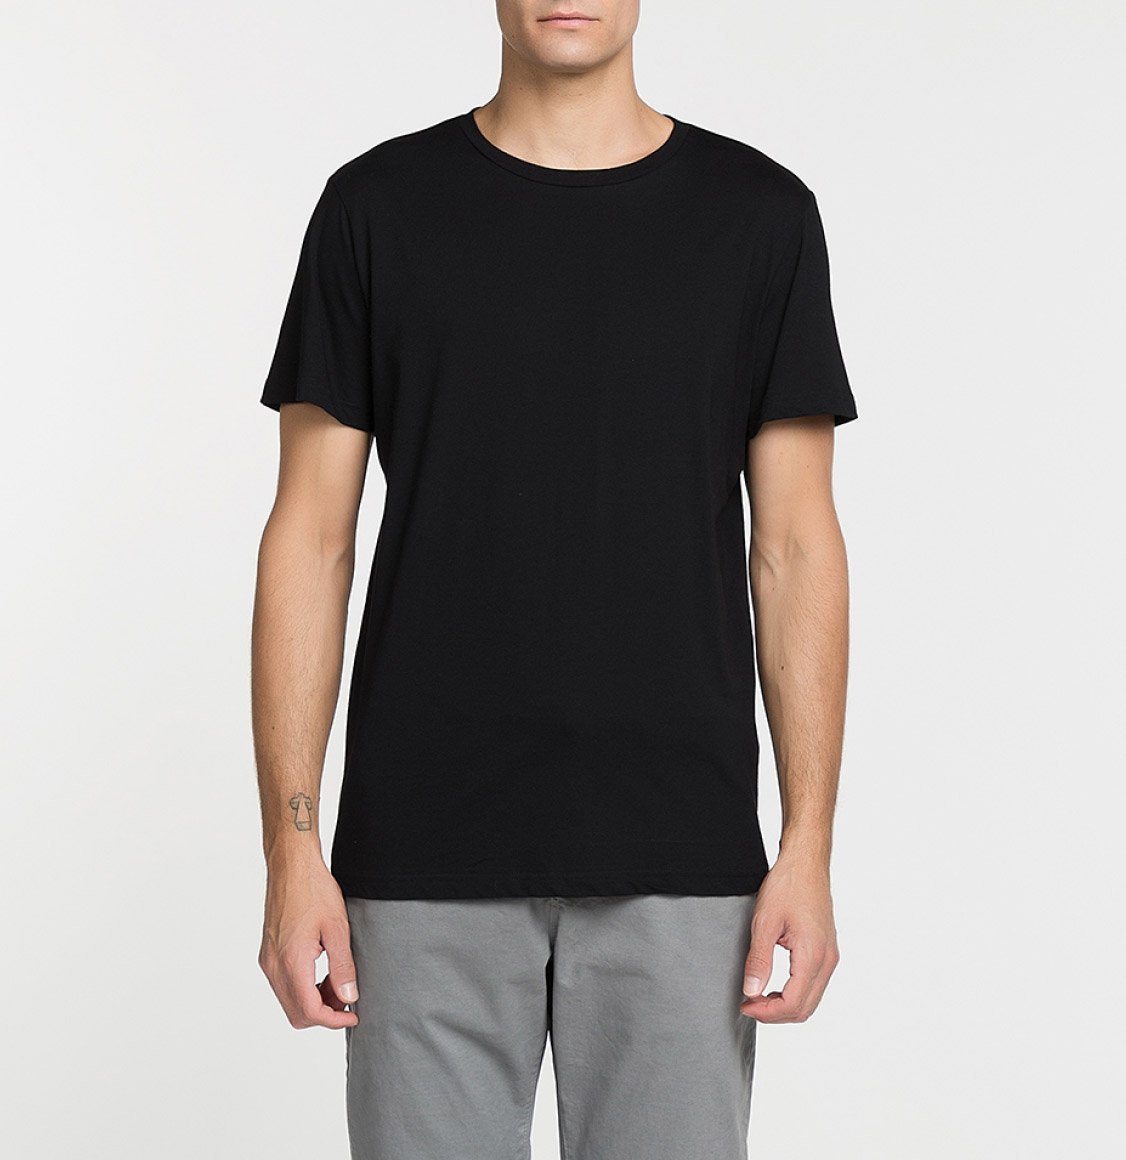 The Project Garments Band V2 Crew Neck T-Shirt Black